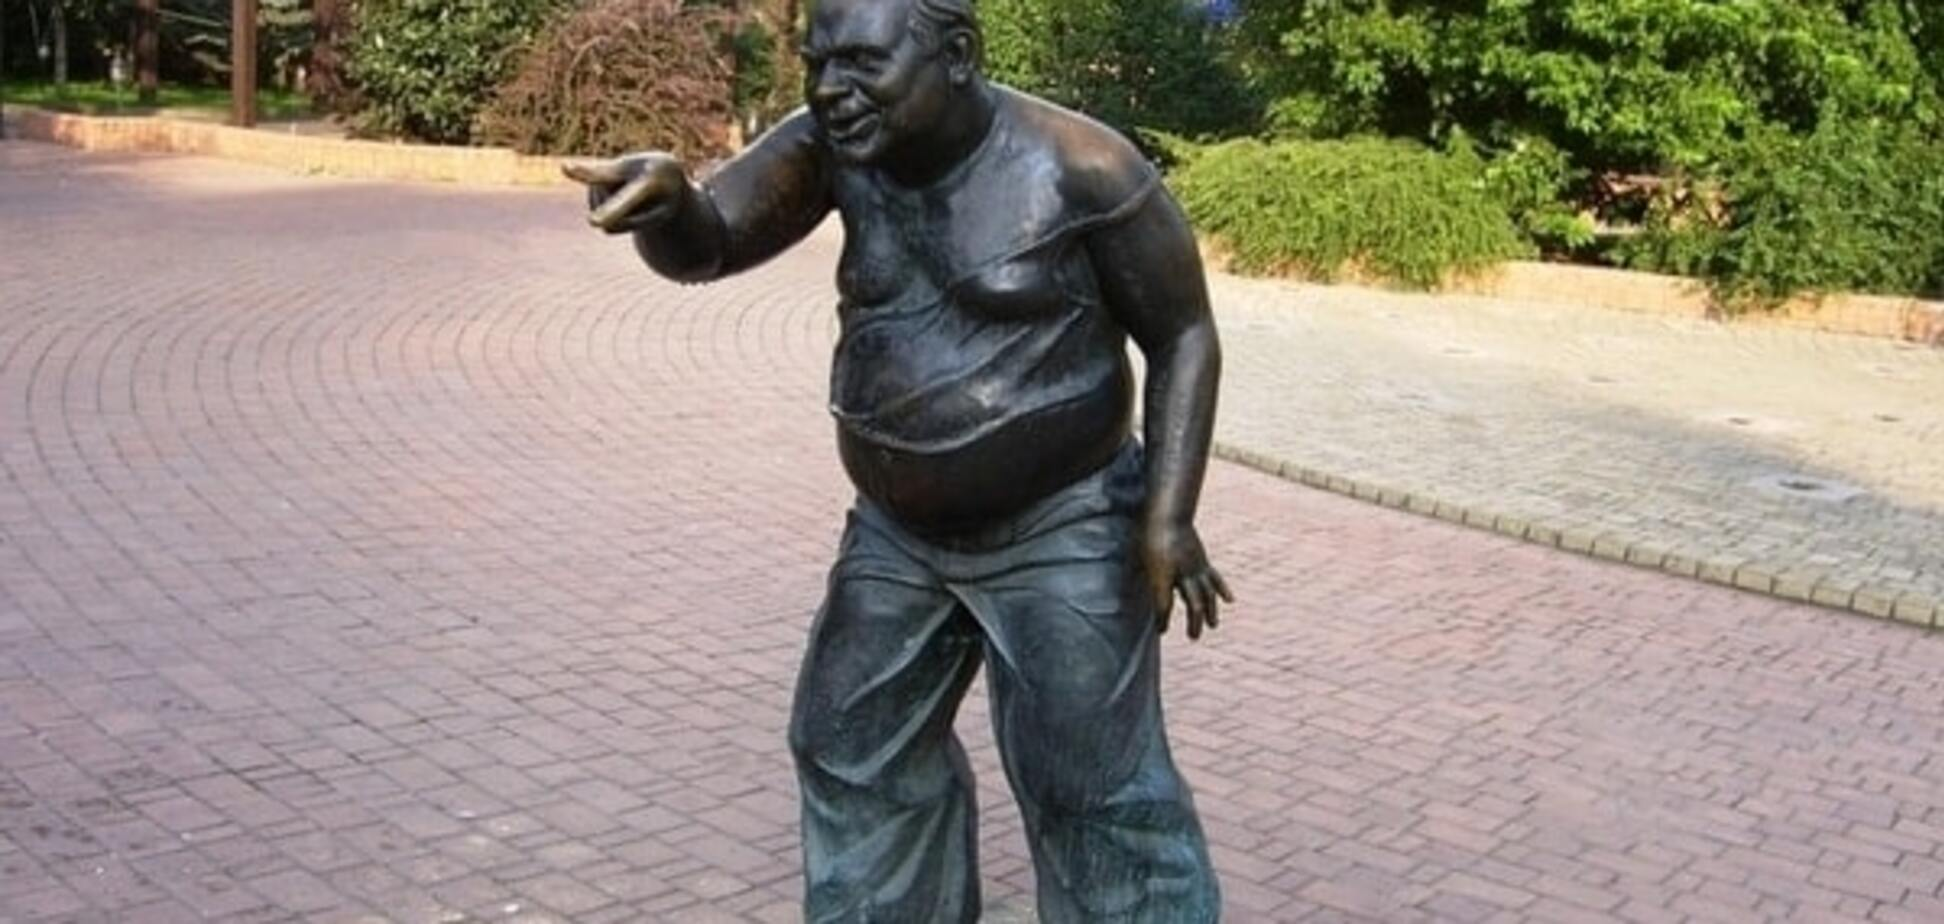 Знайшли 'останки': викрадений в Москві пам'ятник Леонову розпиляли на металобрухт